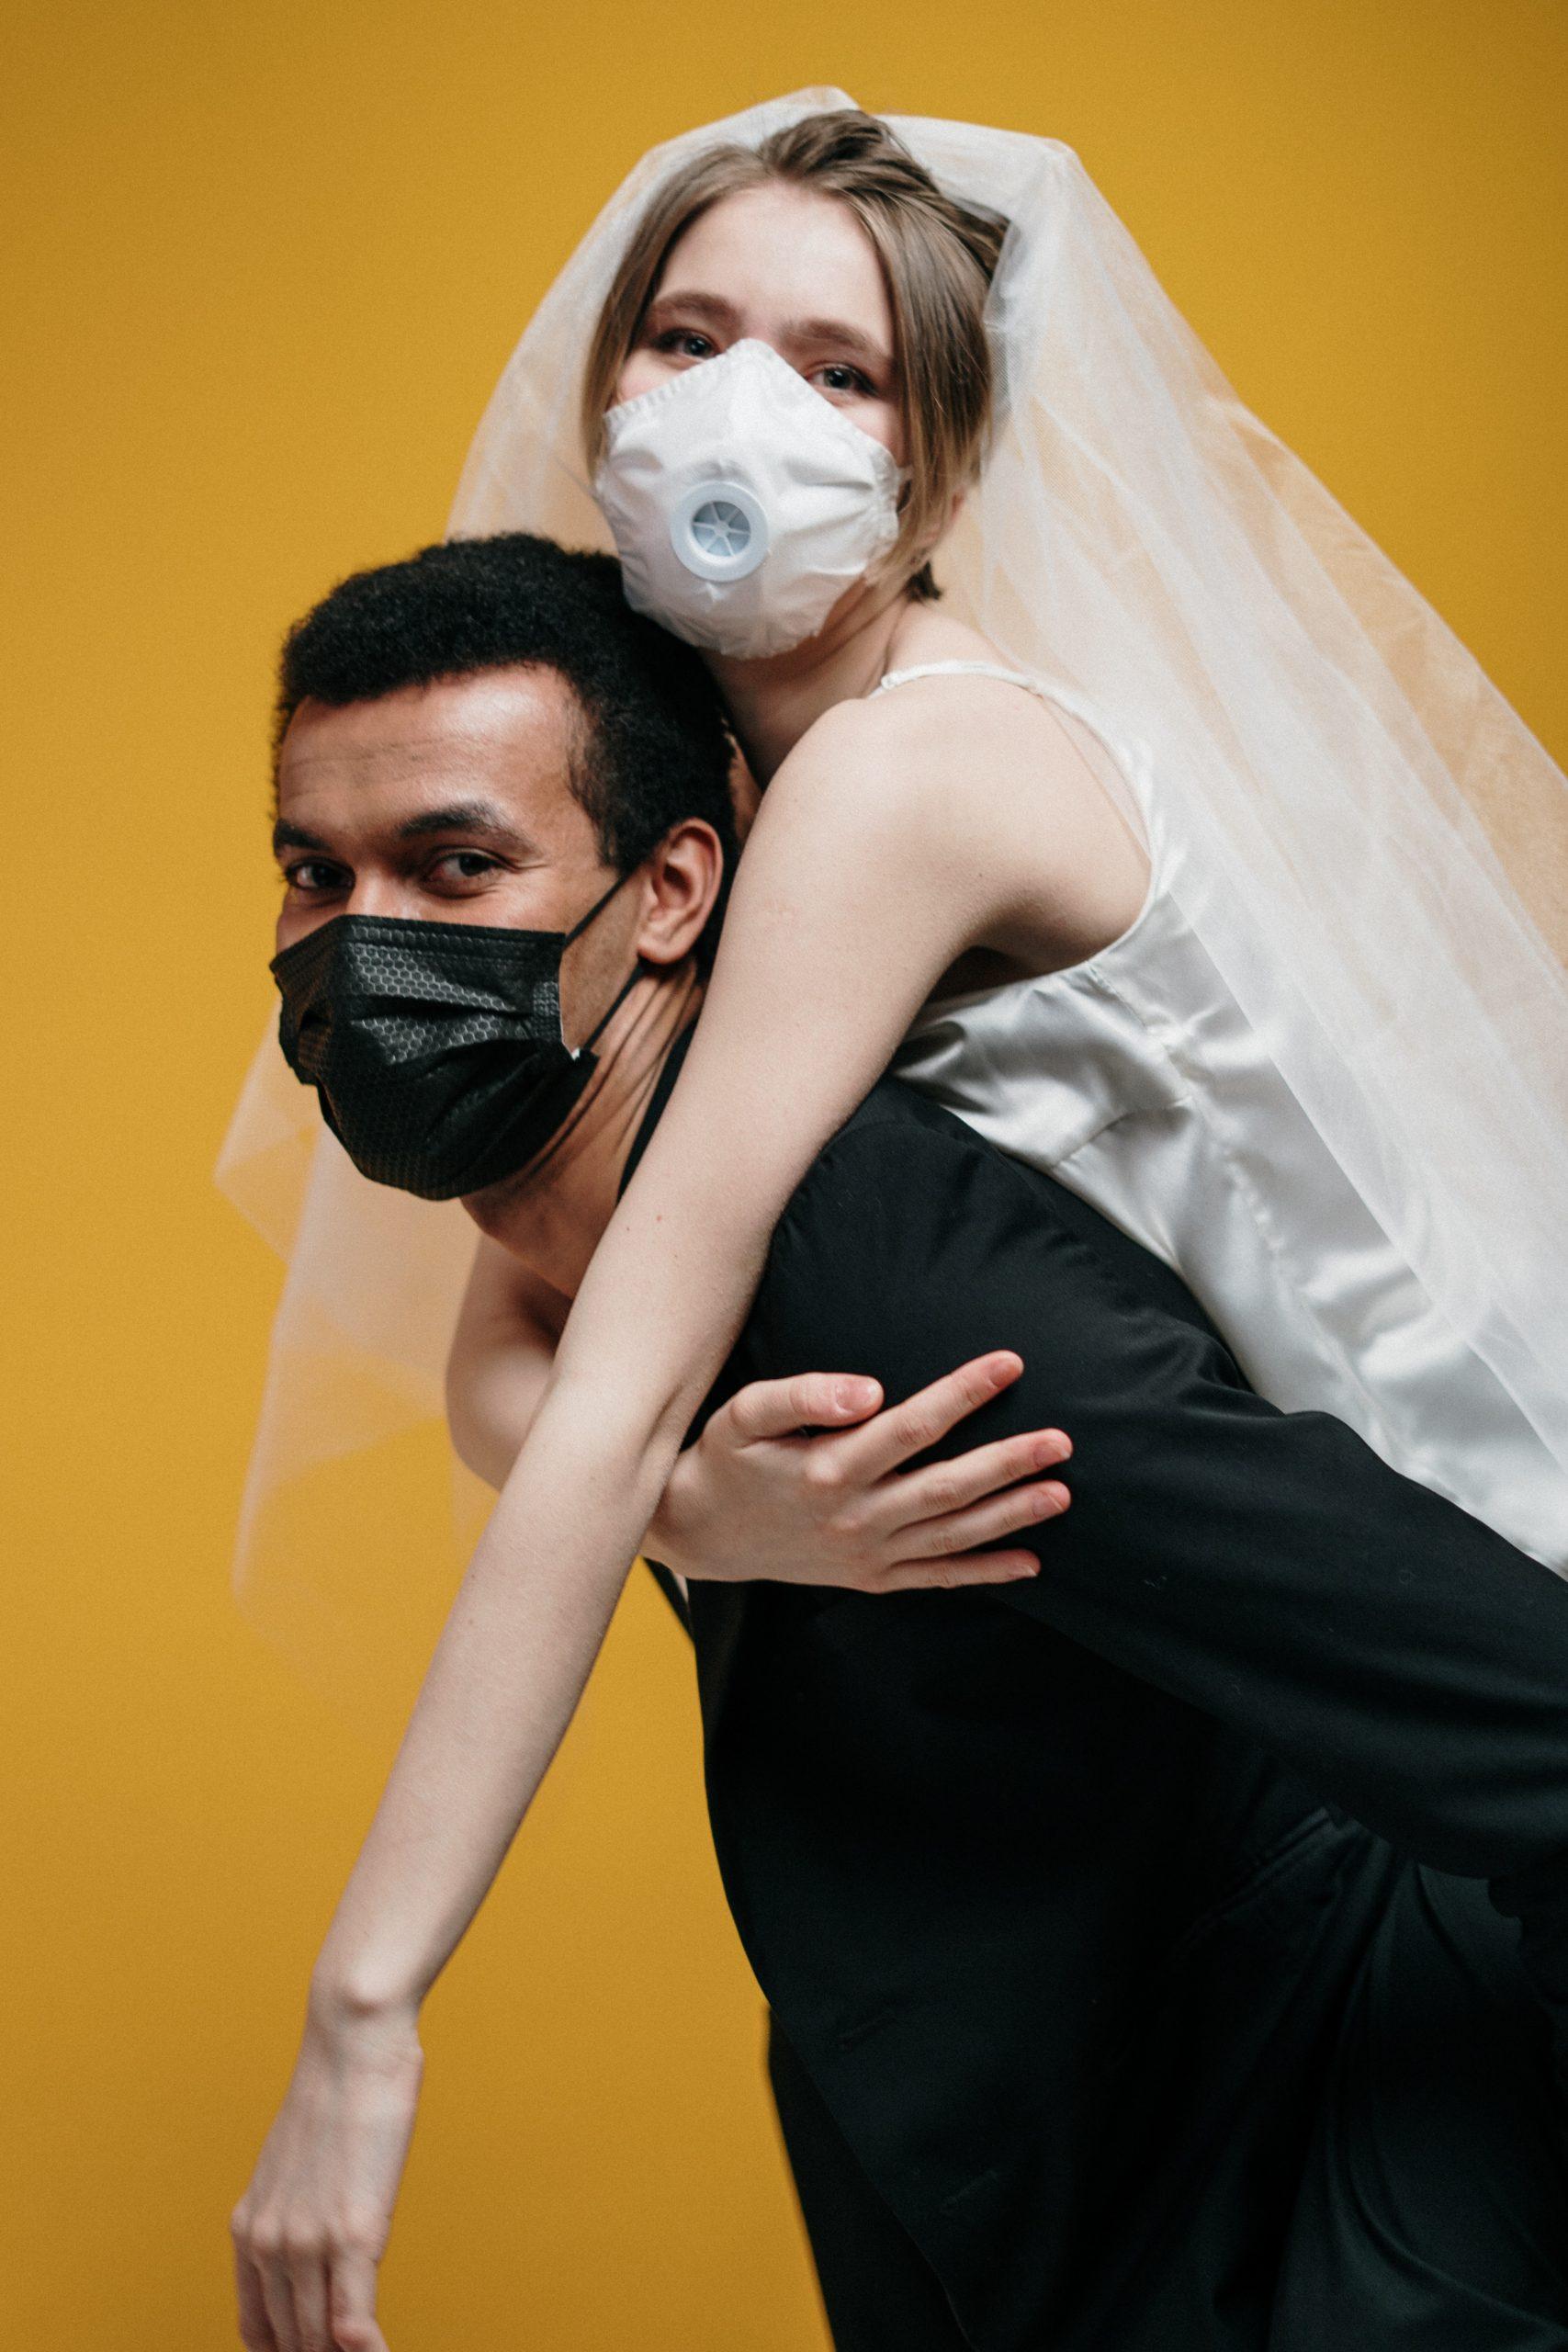 Bride and groom wearing masks; groom giving bride piggy back ride.